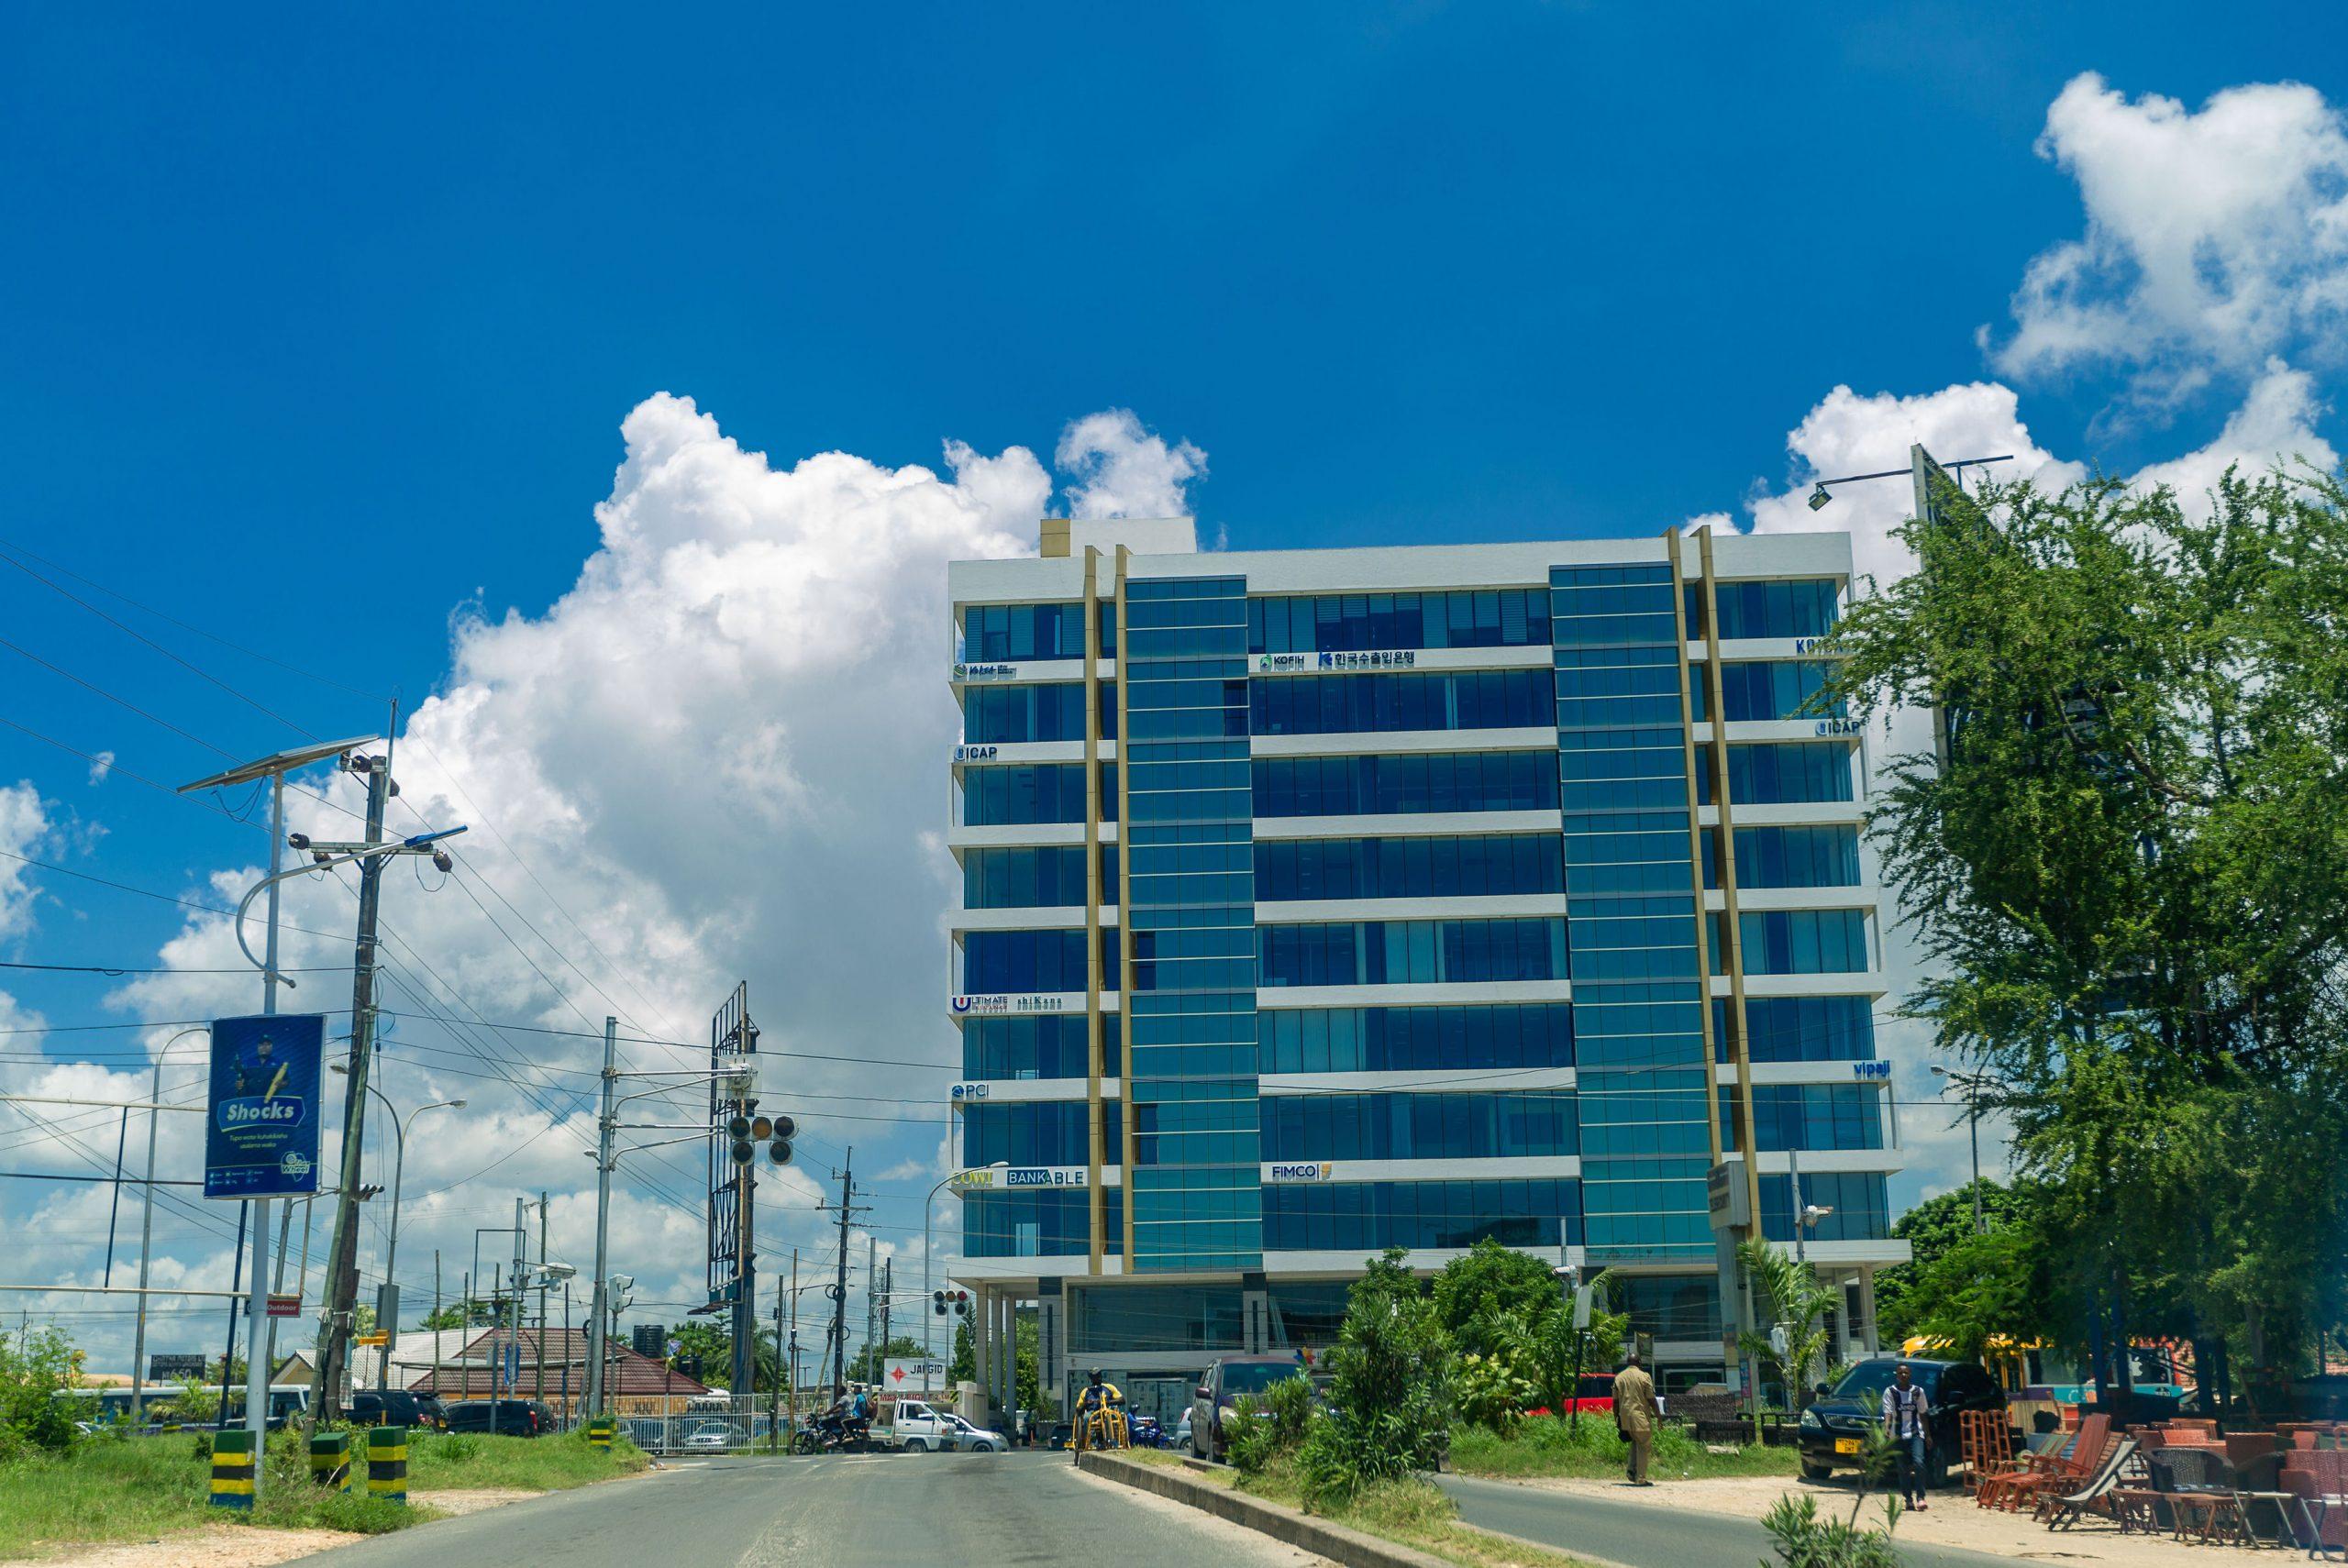 Office For Rent at Jangid Plaza Dar Es Salaam